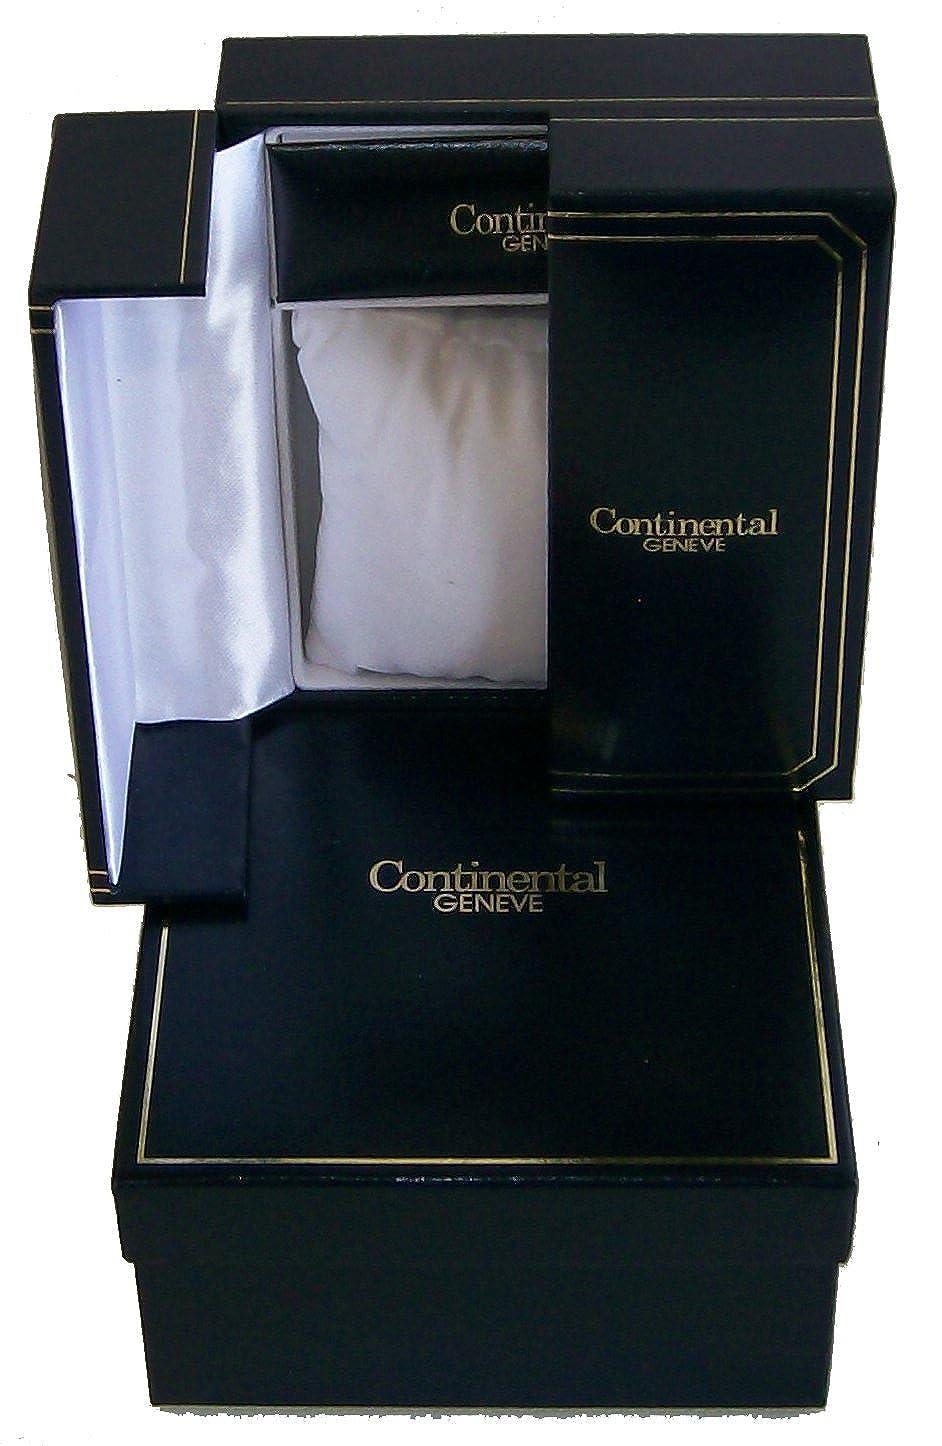 Amazon.com: Continental Geneve